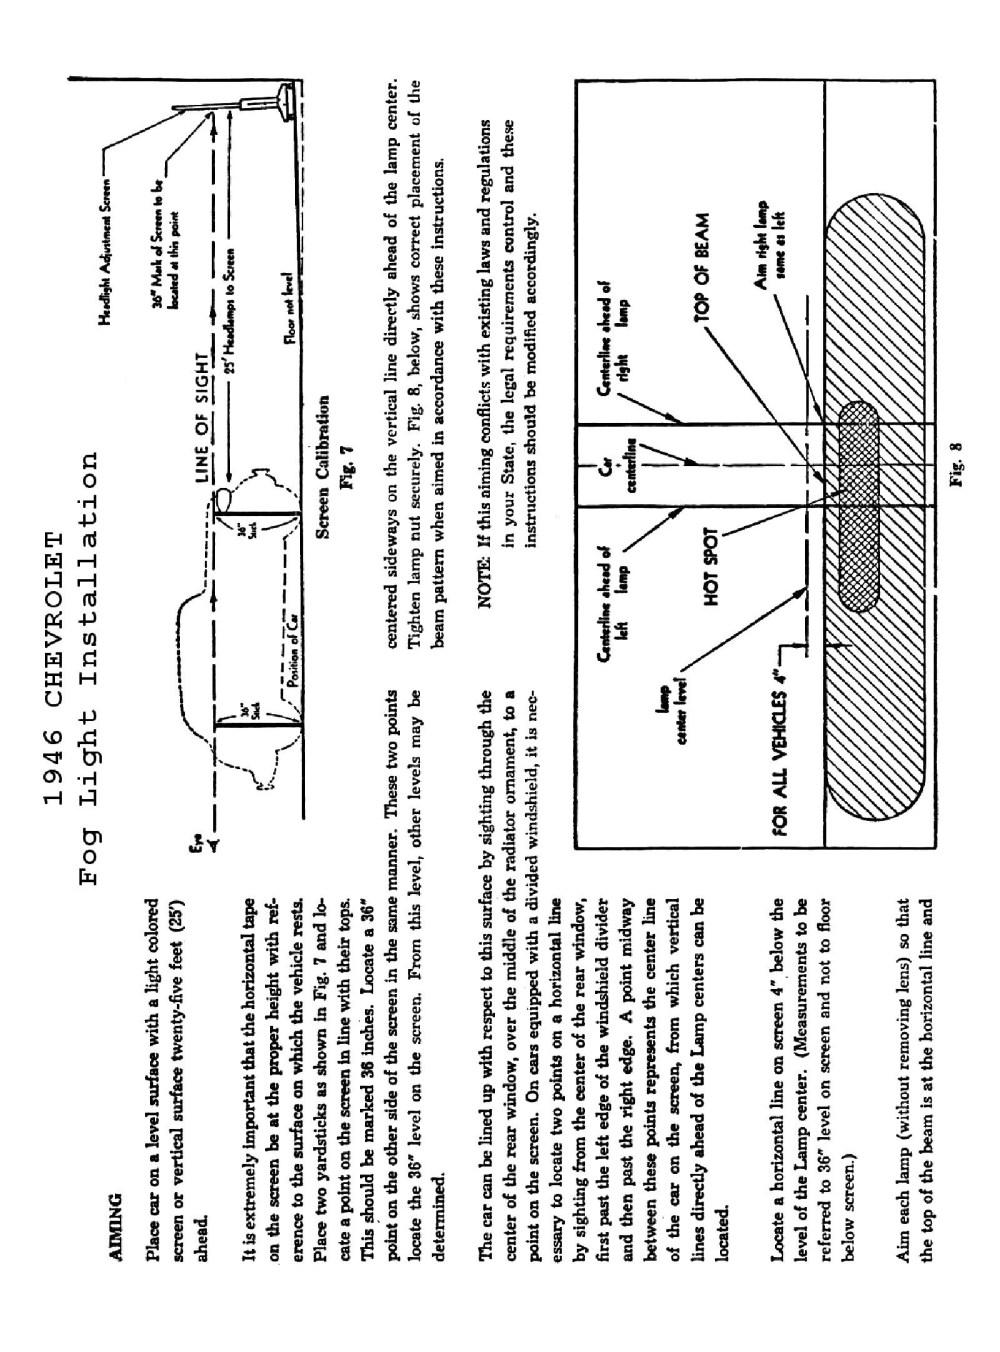 medium resolution of silverado fog light wiring diagram 34 wiring diagram